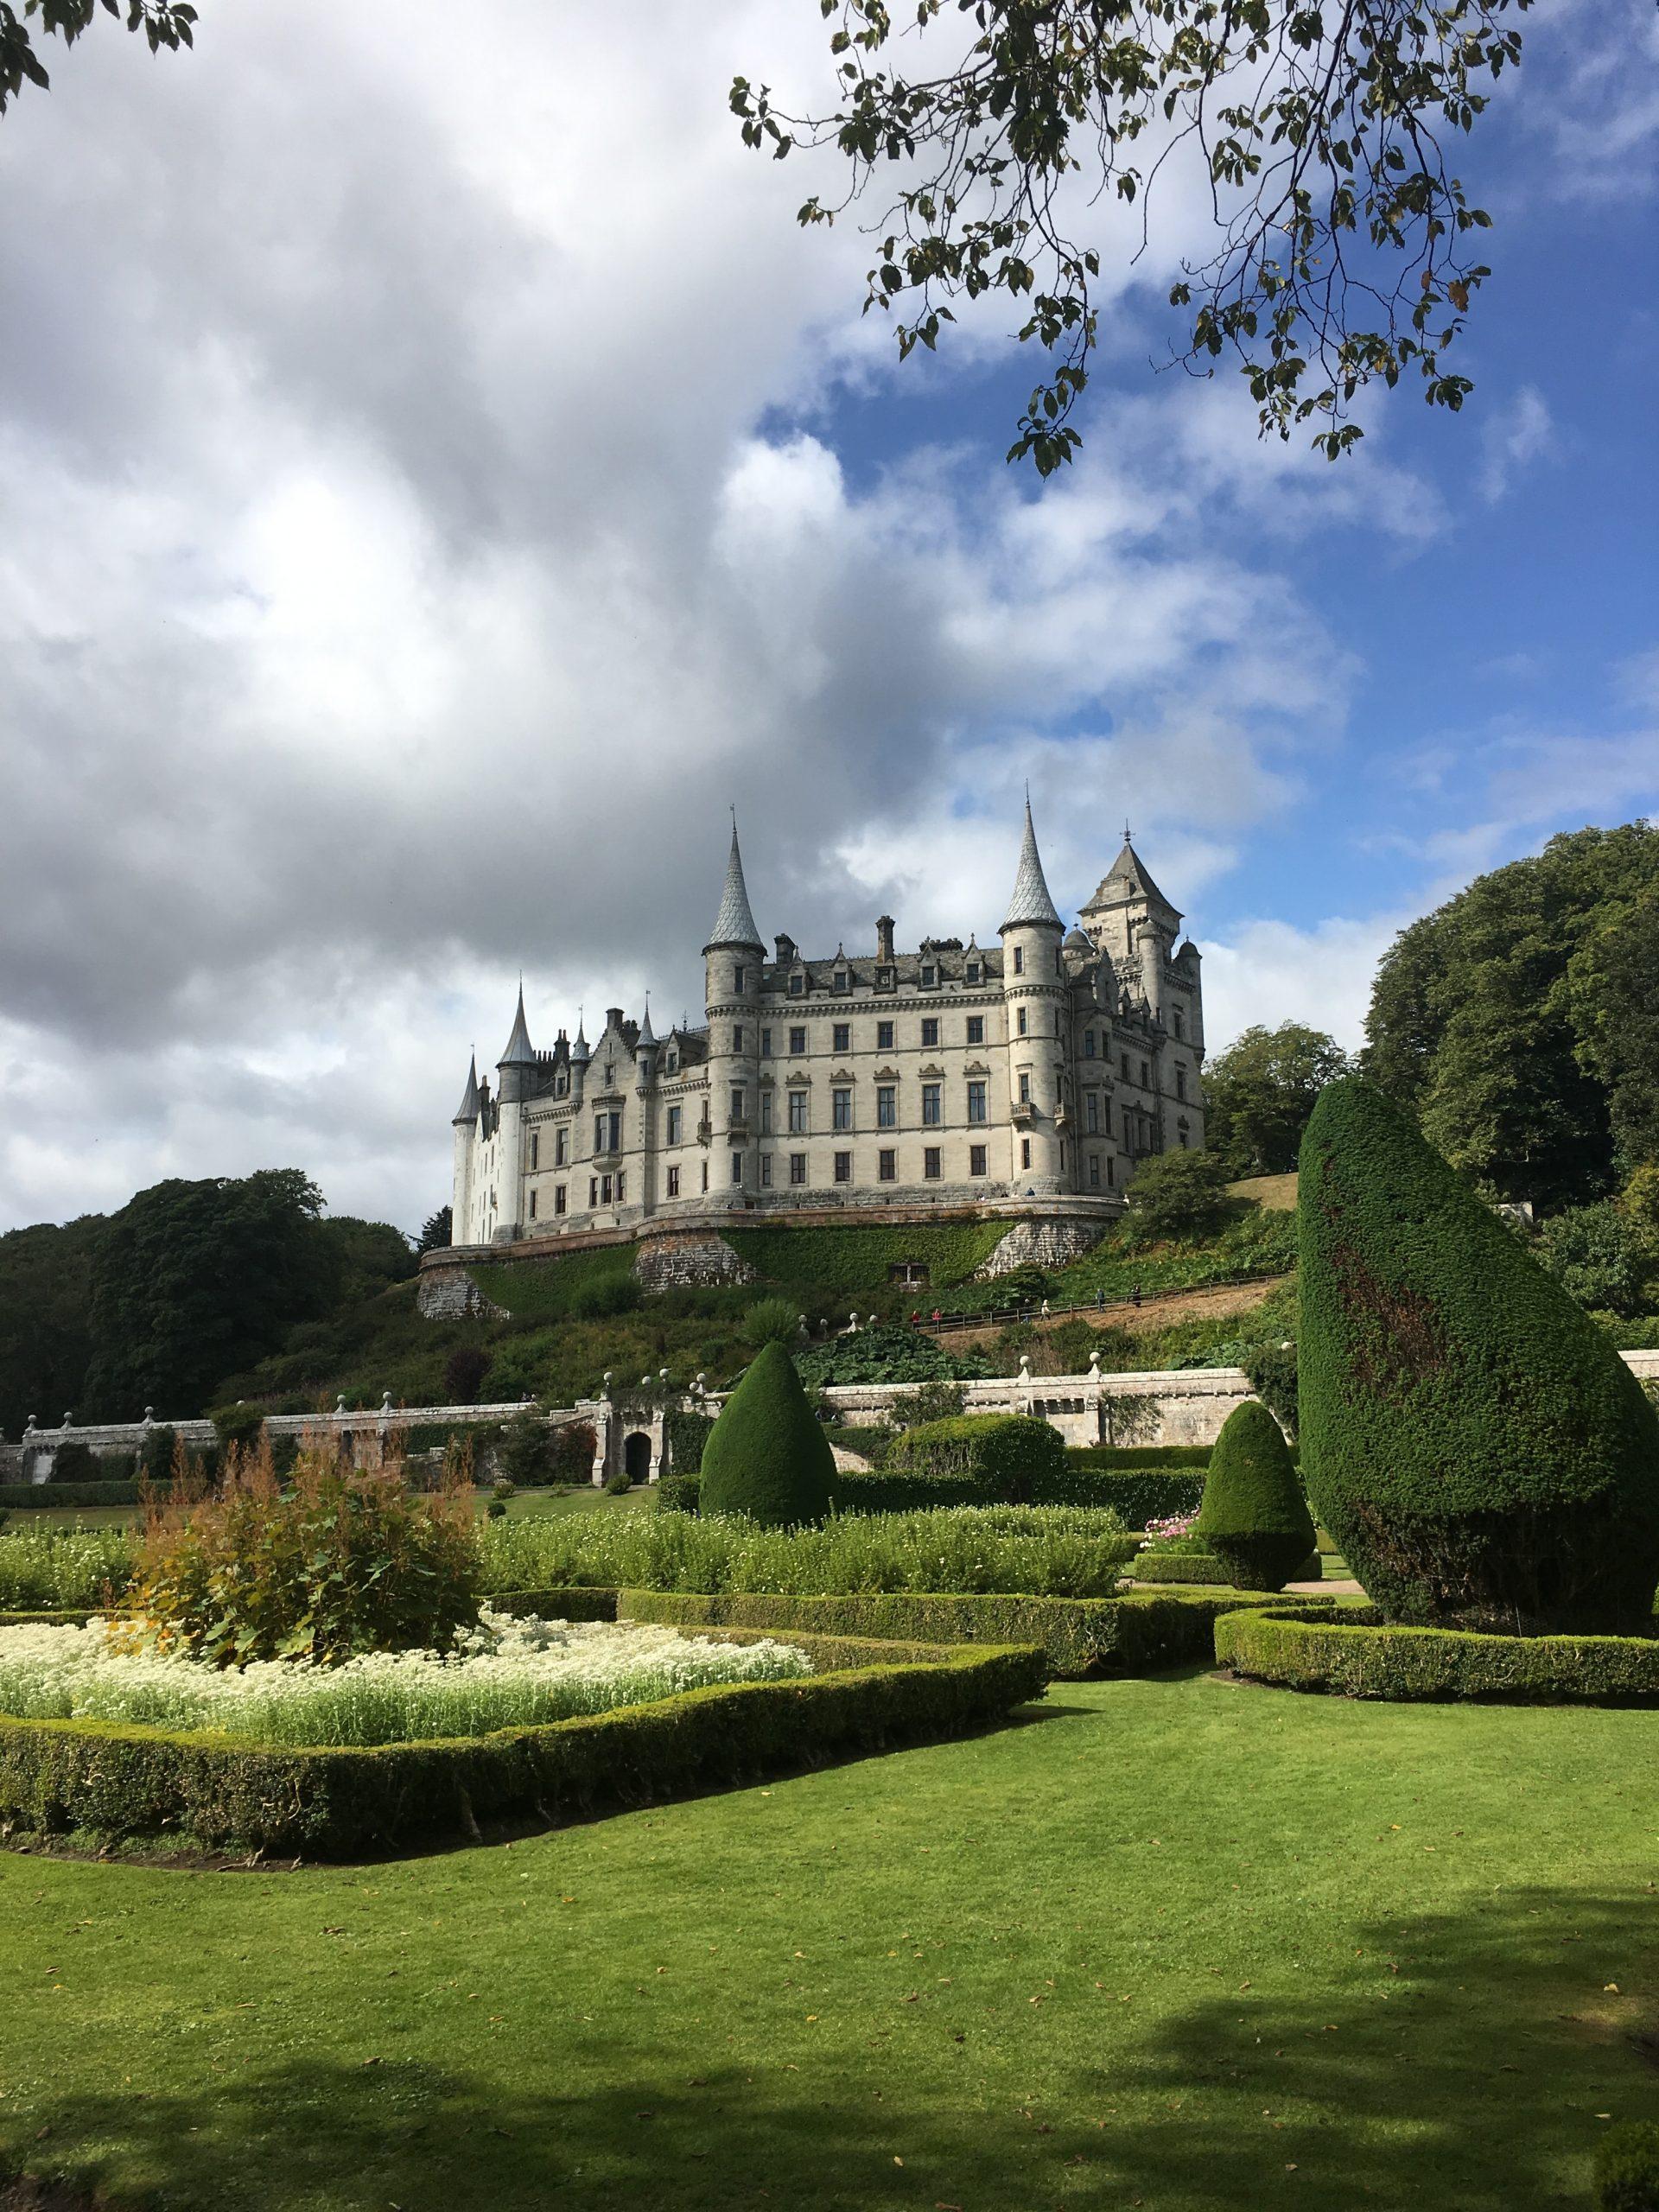 St. Andrews Scotland – Enjoy the Oldest Golf Course